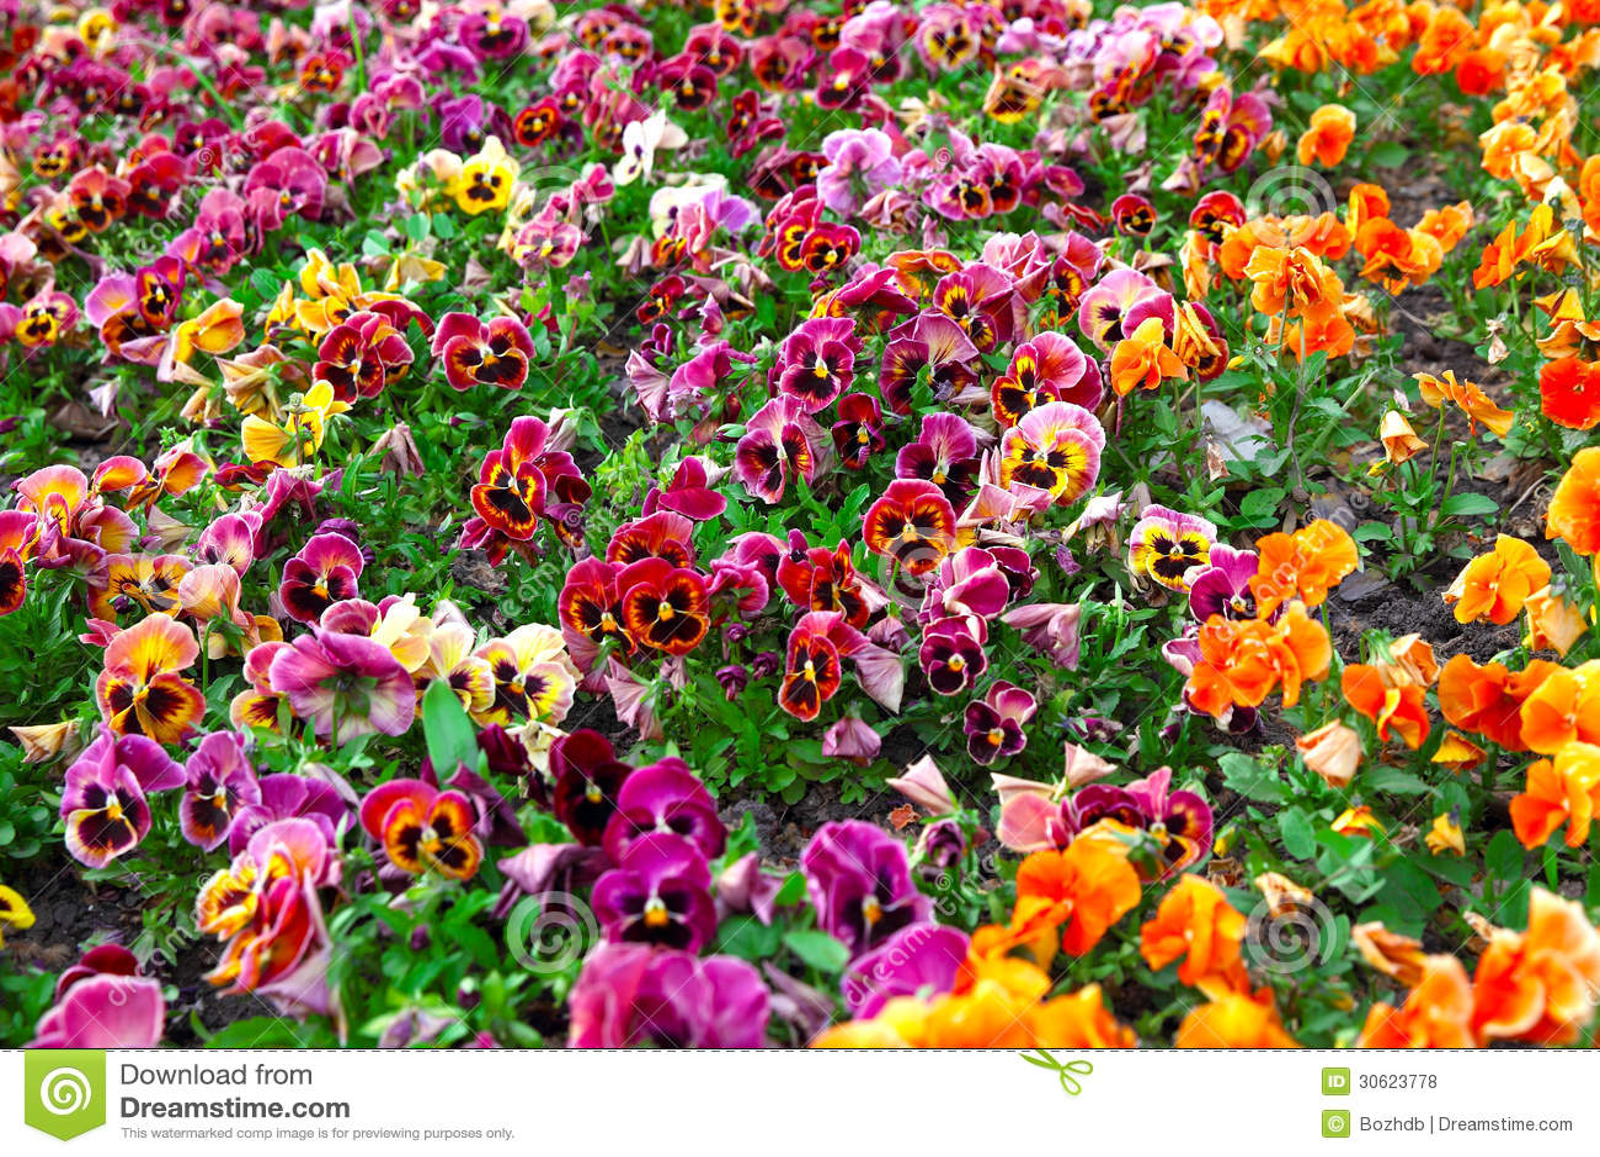 Blumengarten Bilder heartsease blumengarten lizenzfreie stockfotos bild 30623778